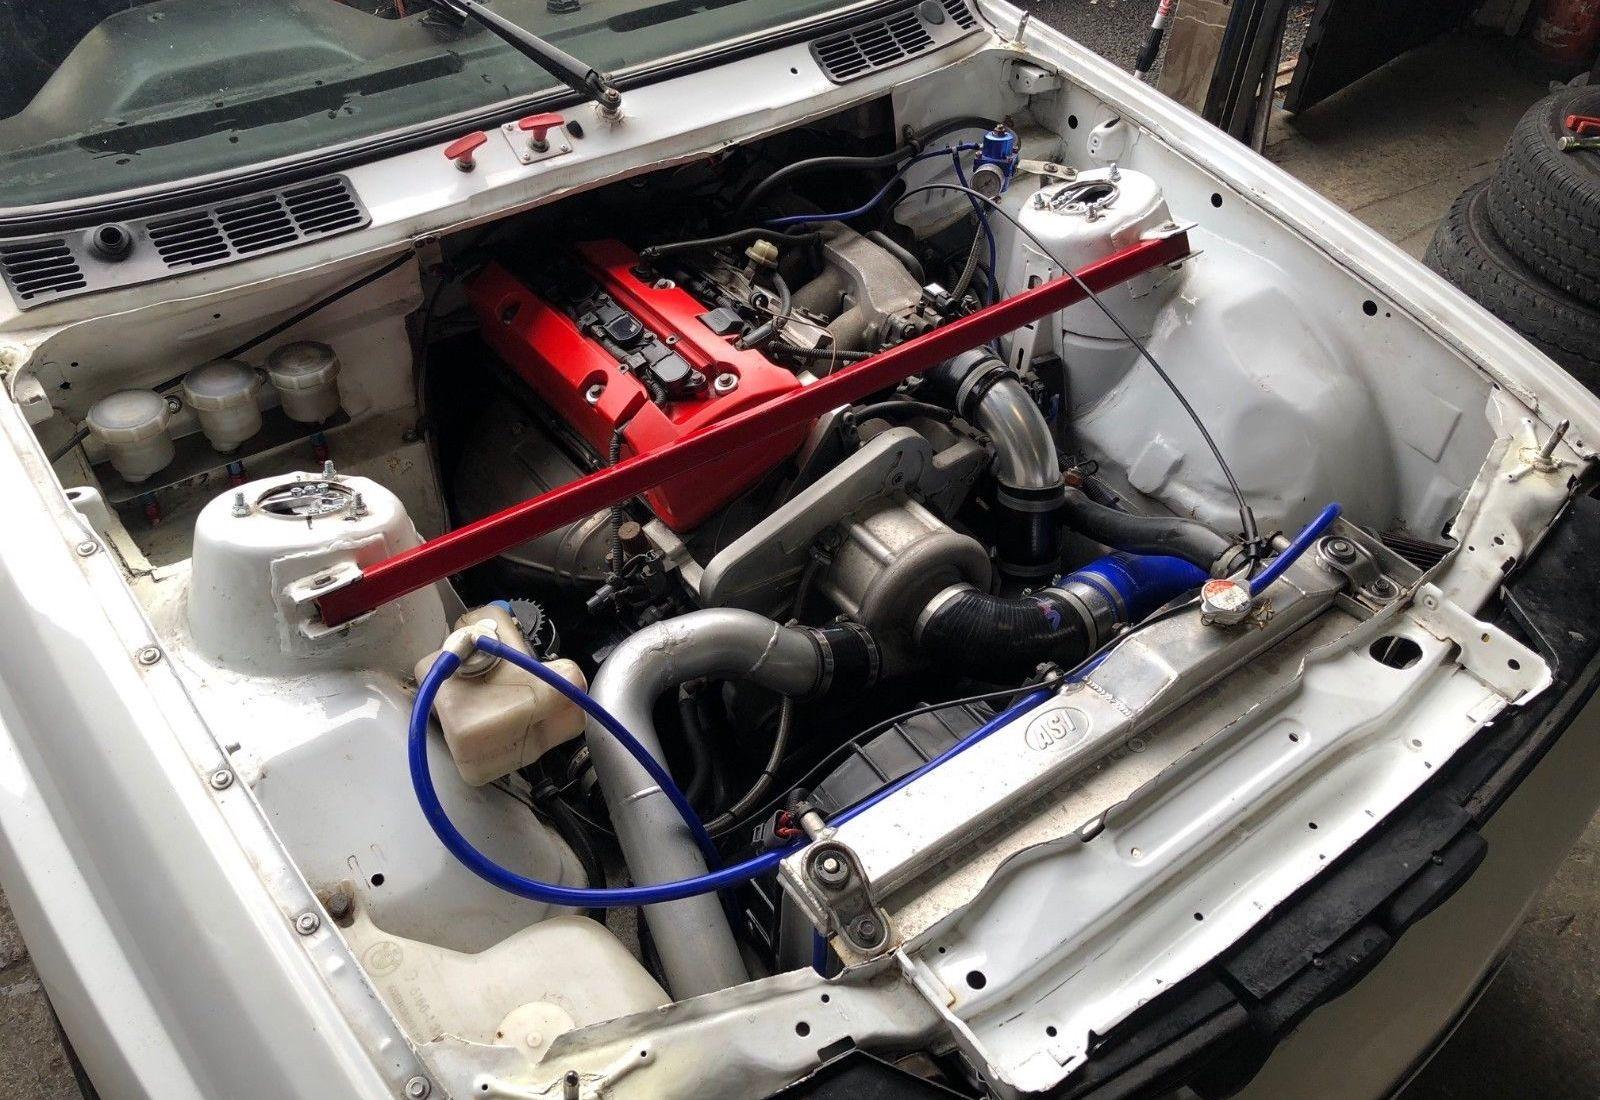 For Sale: BMW E30 3 Series with Honda F20C engine conversion | PerformanceDrive